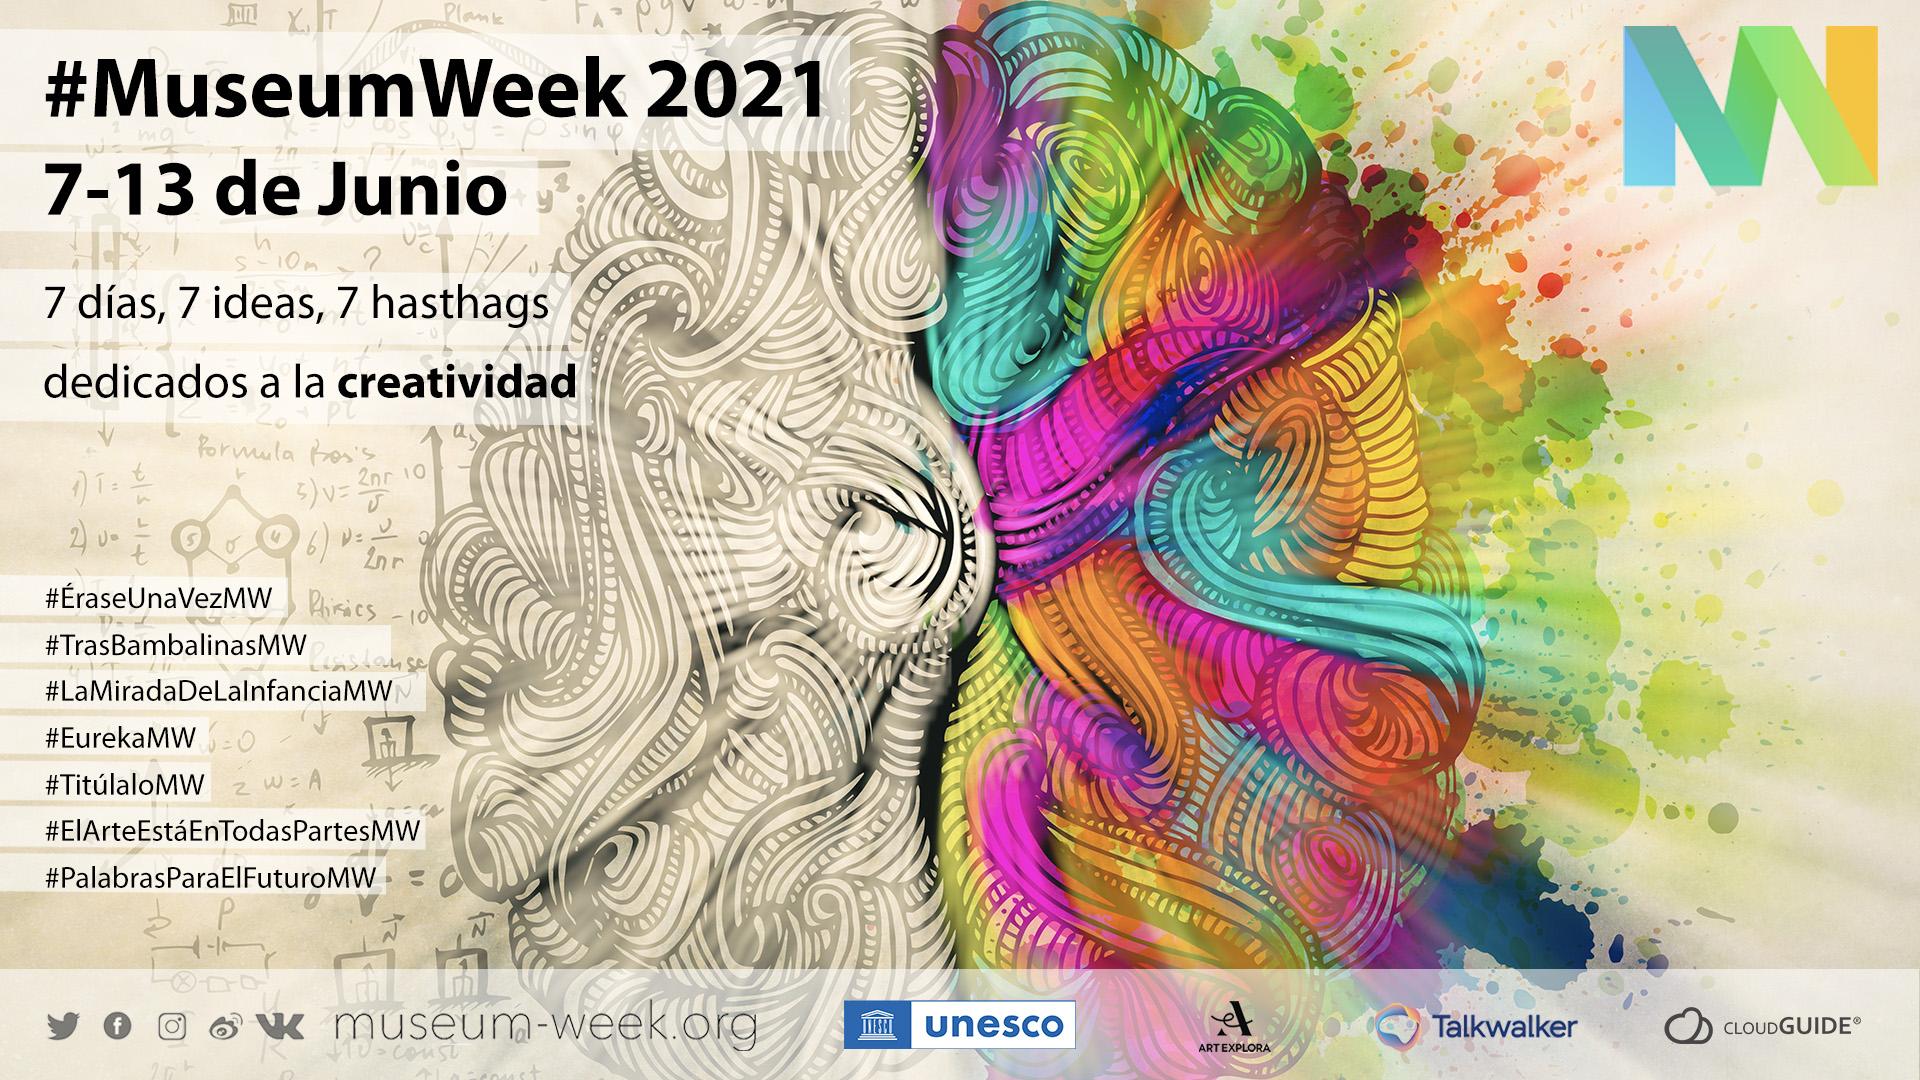 landscape-MuseumWeek-2021-SPANISH